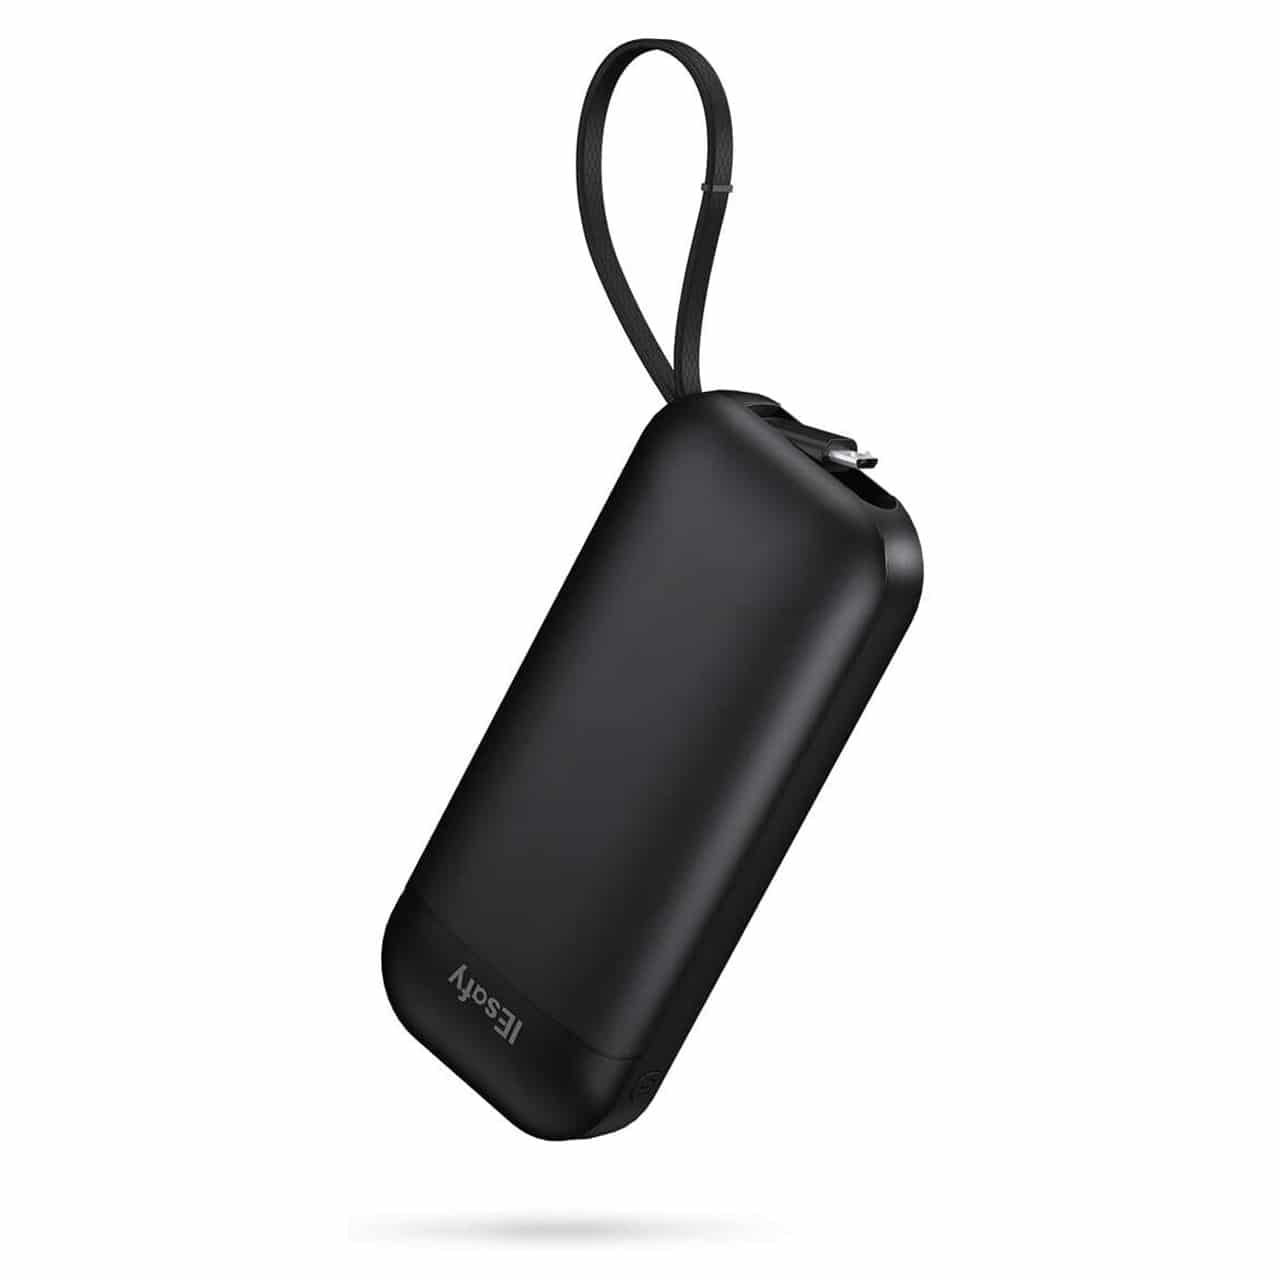 Batterie externe 10000mAh IEsafy | Kuulaa Tech